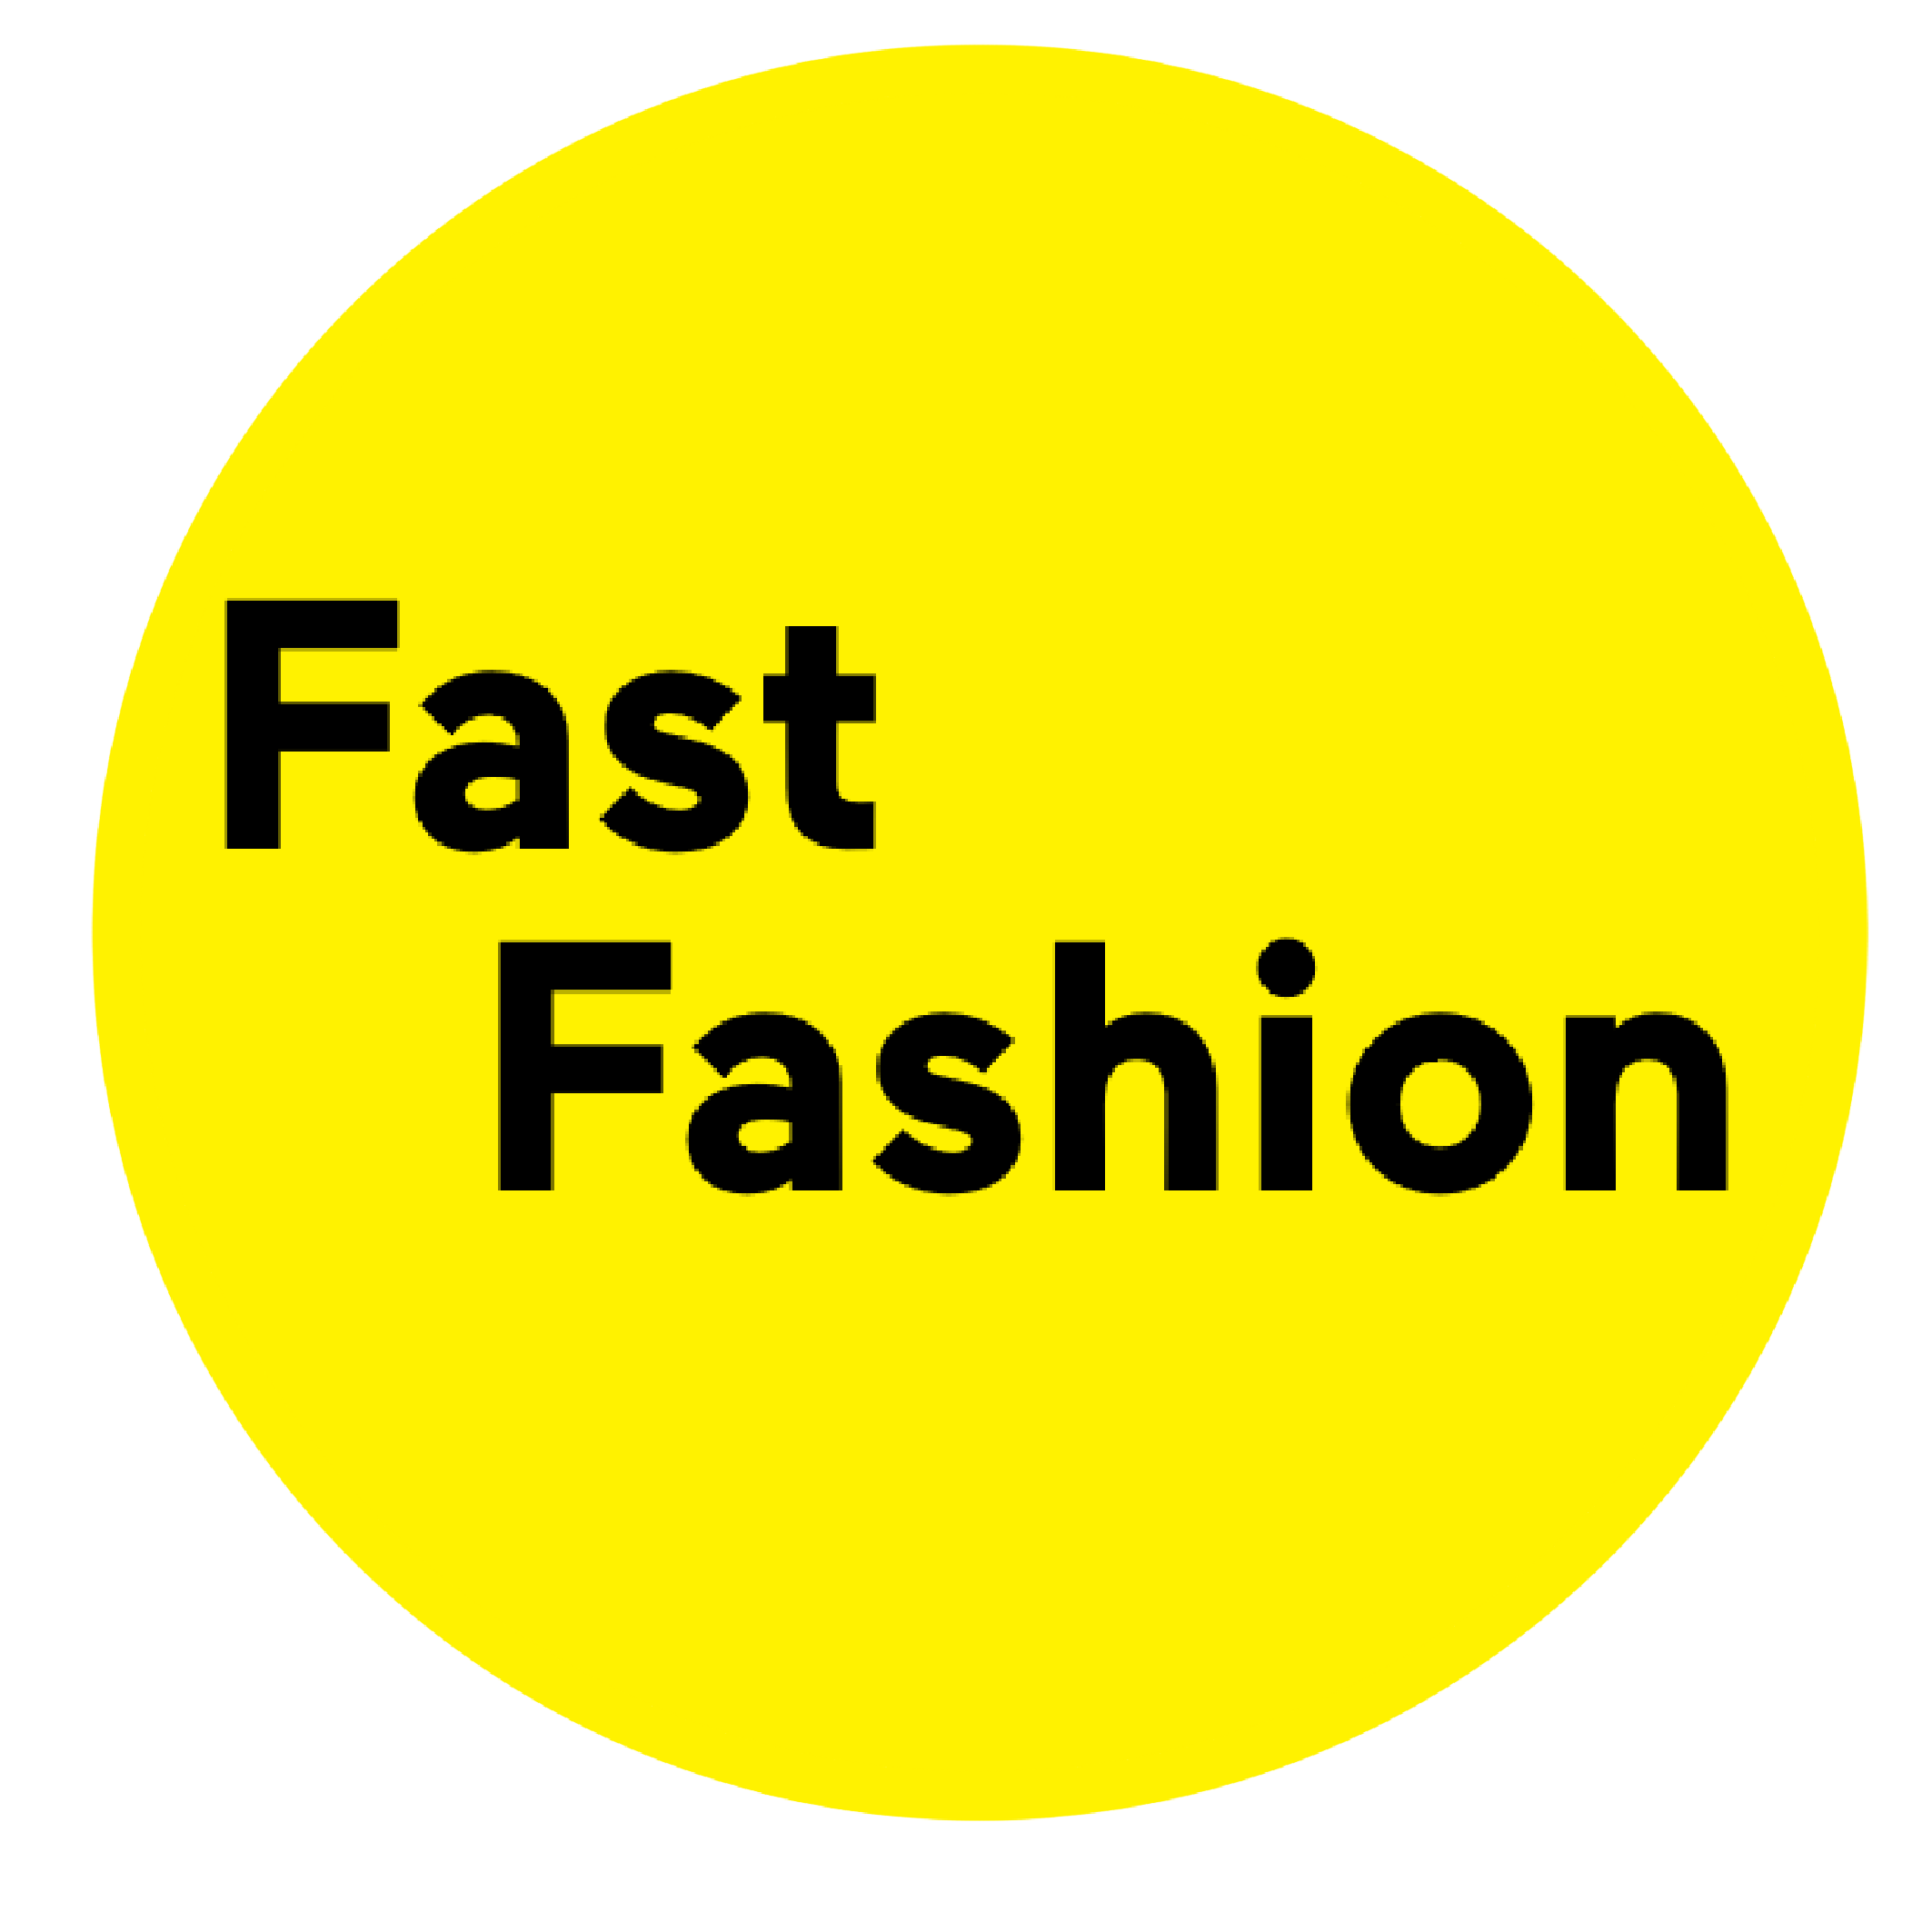 Fast Fashion.png